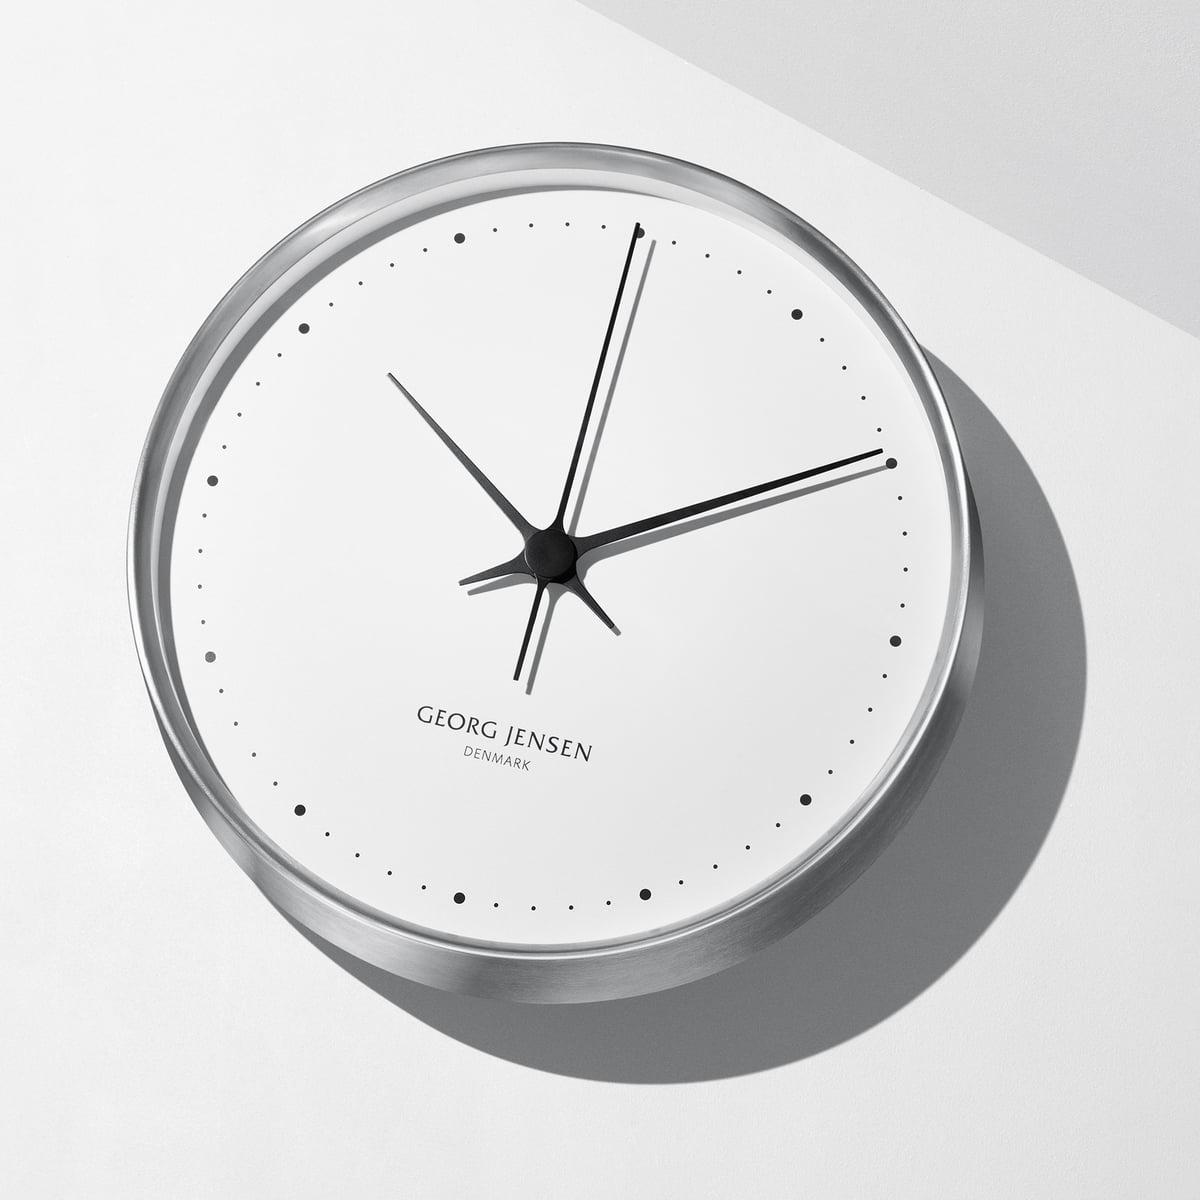 Georg Jensen Henning Koppel Wall Clock